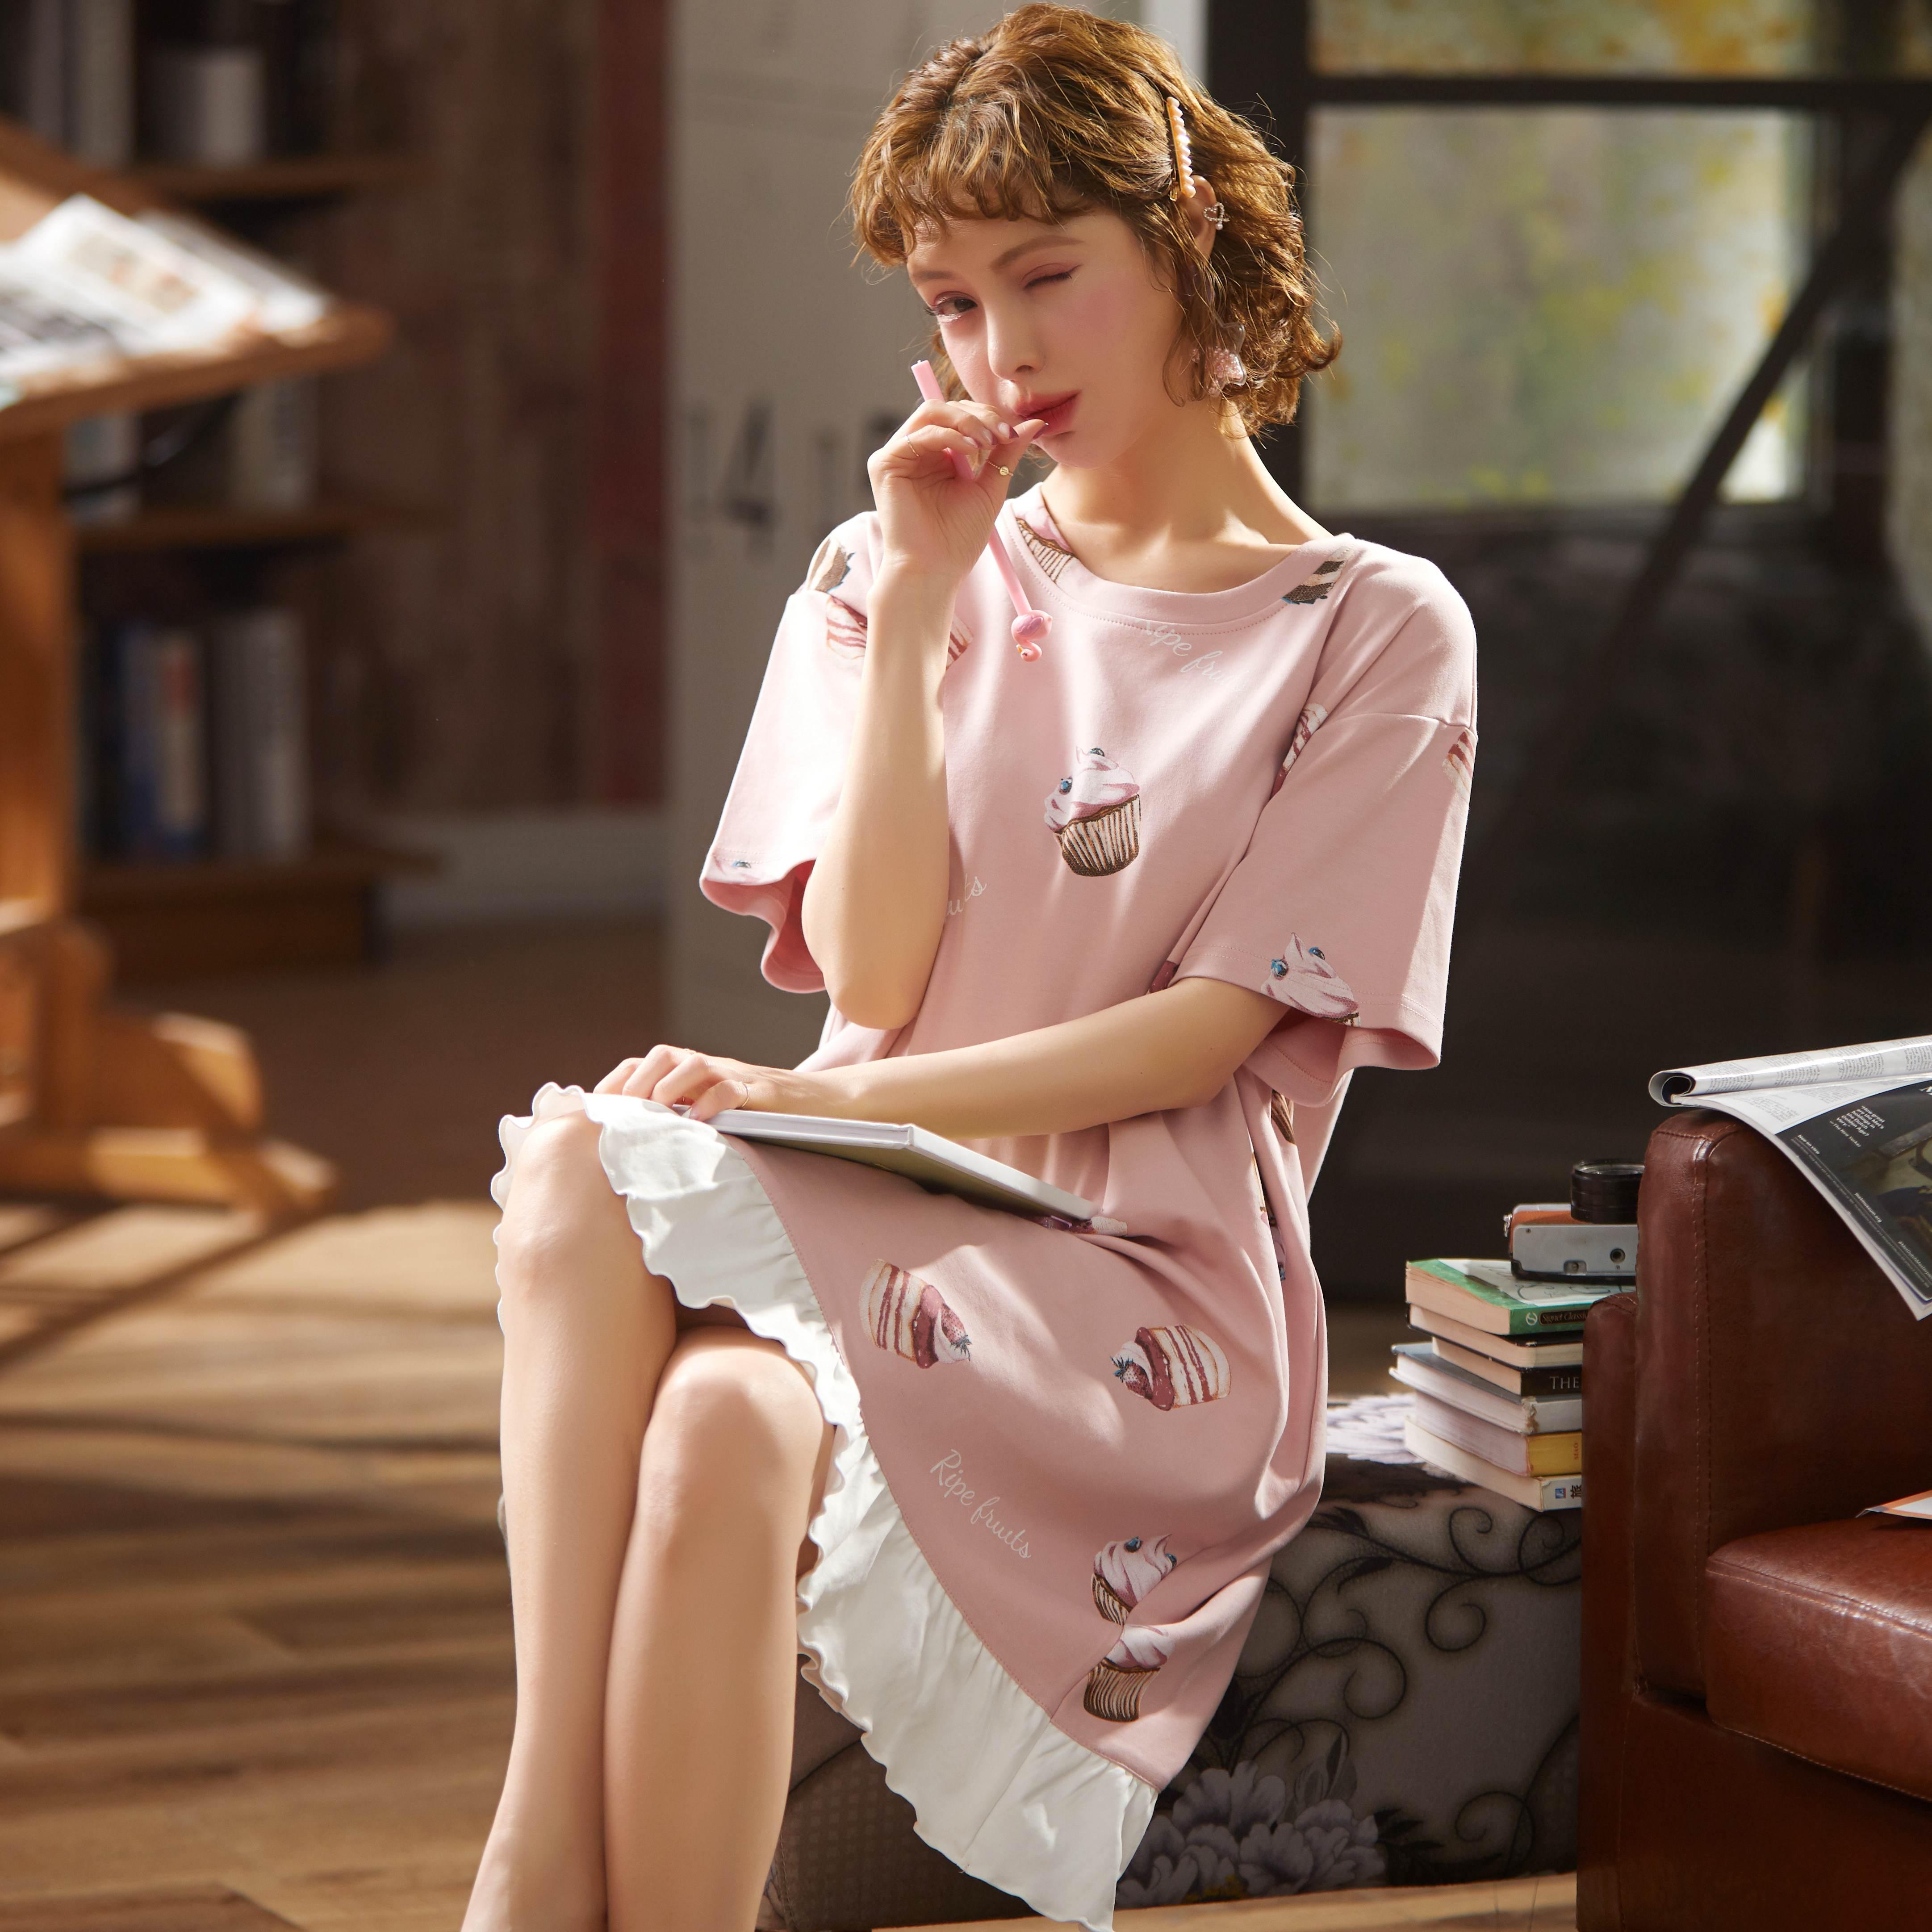 100% Cotton Women Sleepshirts Nightgowns Cartoon Night Dress Fashion Girls Nighty Sleepwear Ladies Nightwear Summer Homewear 2